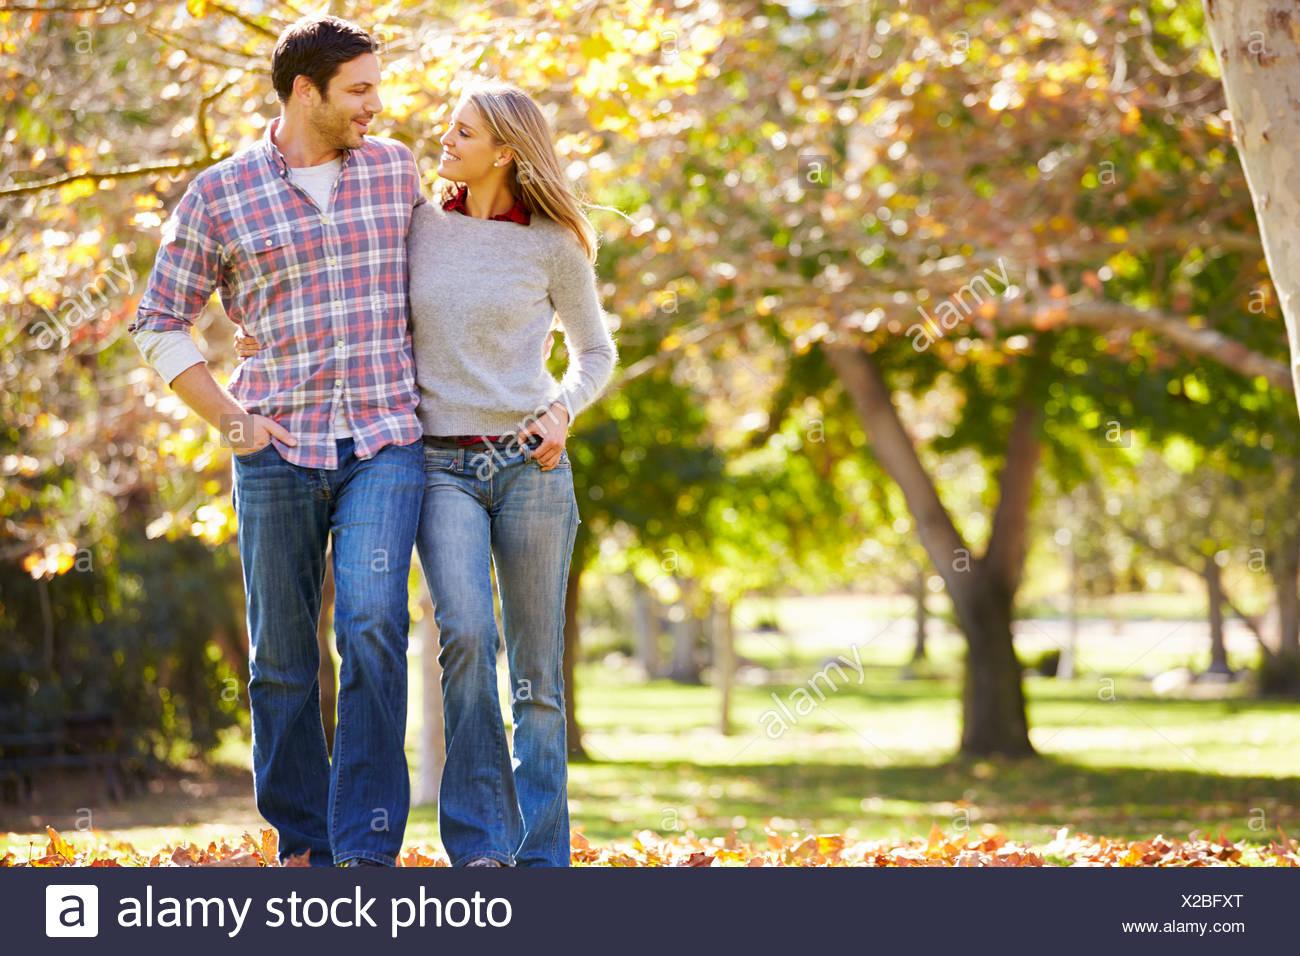 Romantic Couple Walking Through Autumn Woodland - Stock Image